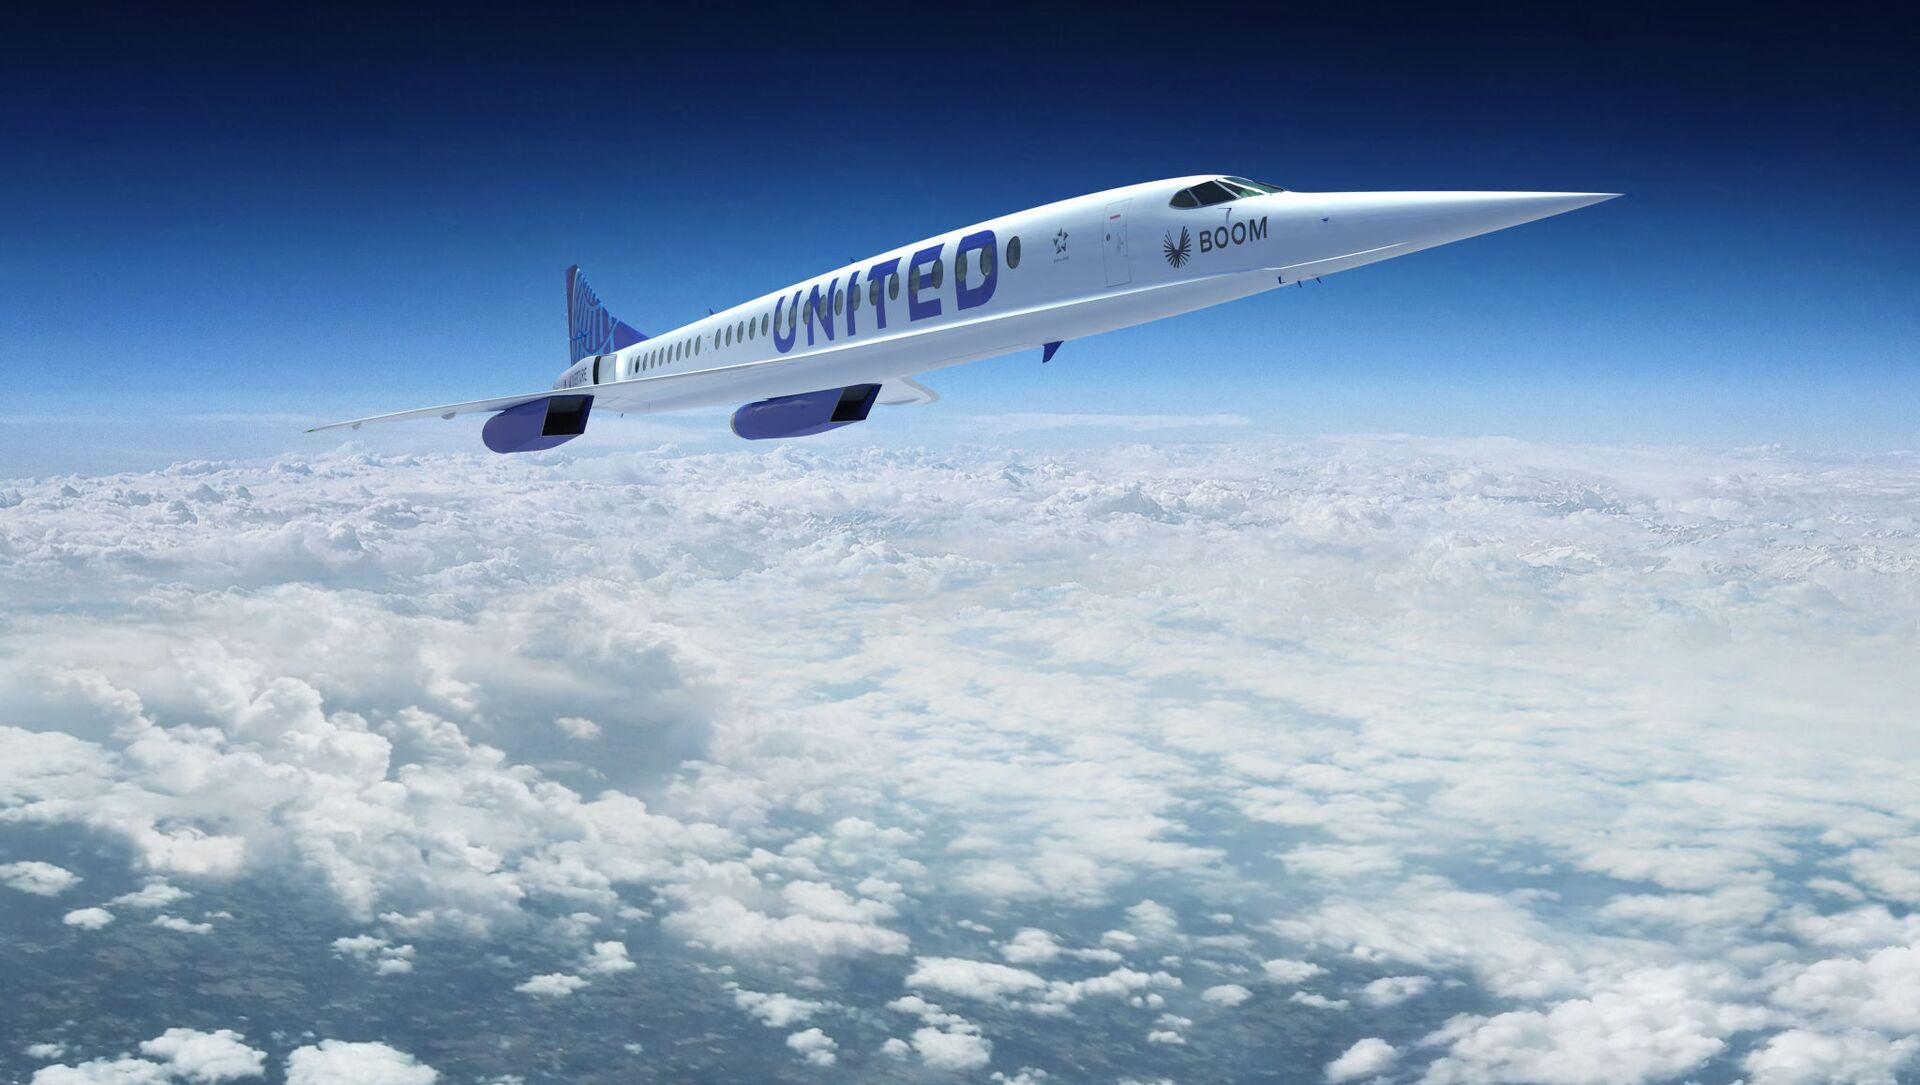 Релиз сверхзвукового самолета Boom Overture с логотипом авиакомпании United Airlines  - Sputnik Азербайджан, 1920, 08.06.2021